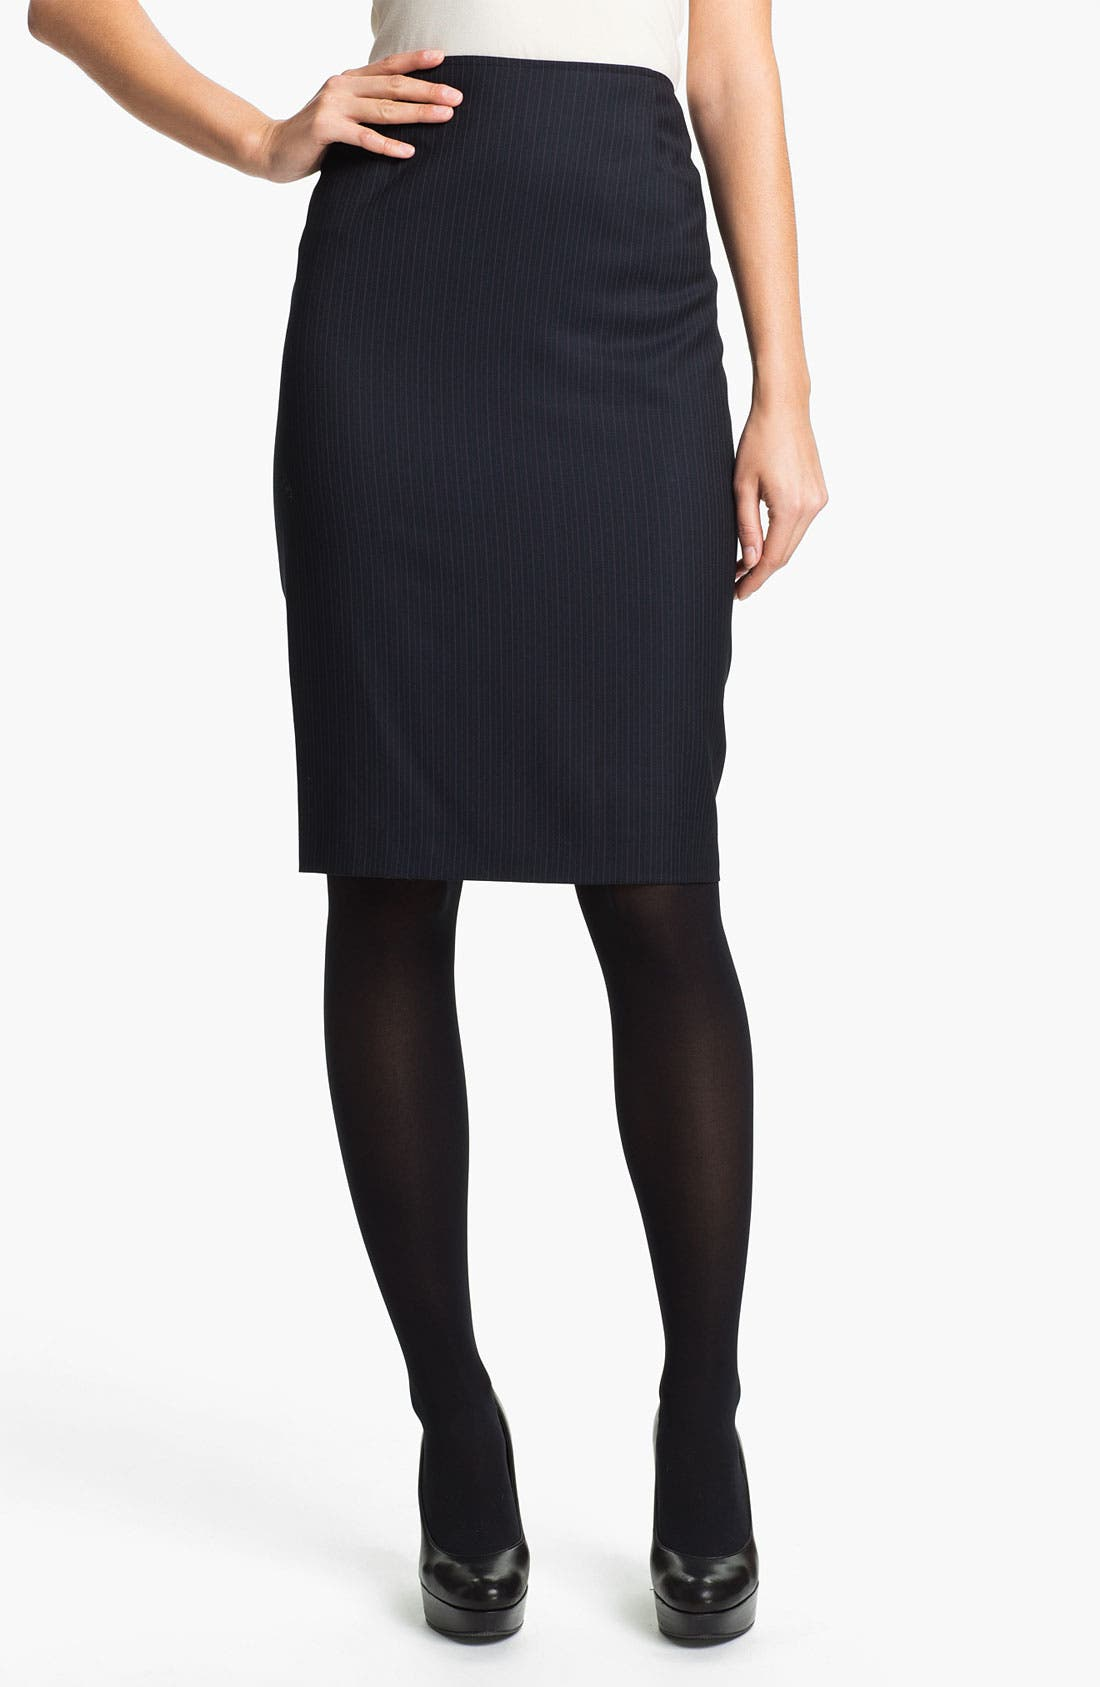 Alternate Image 1 Selected - Santorelli 'Maria' Stripe Wool Skirt